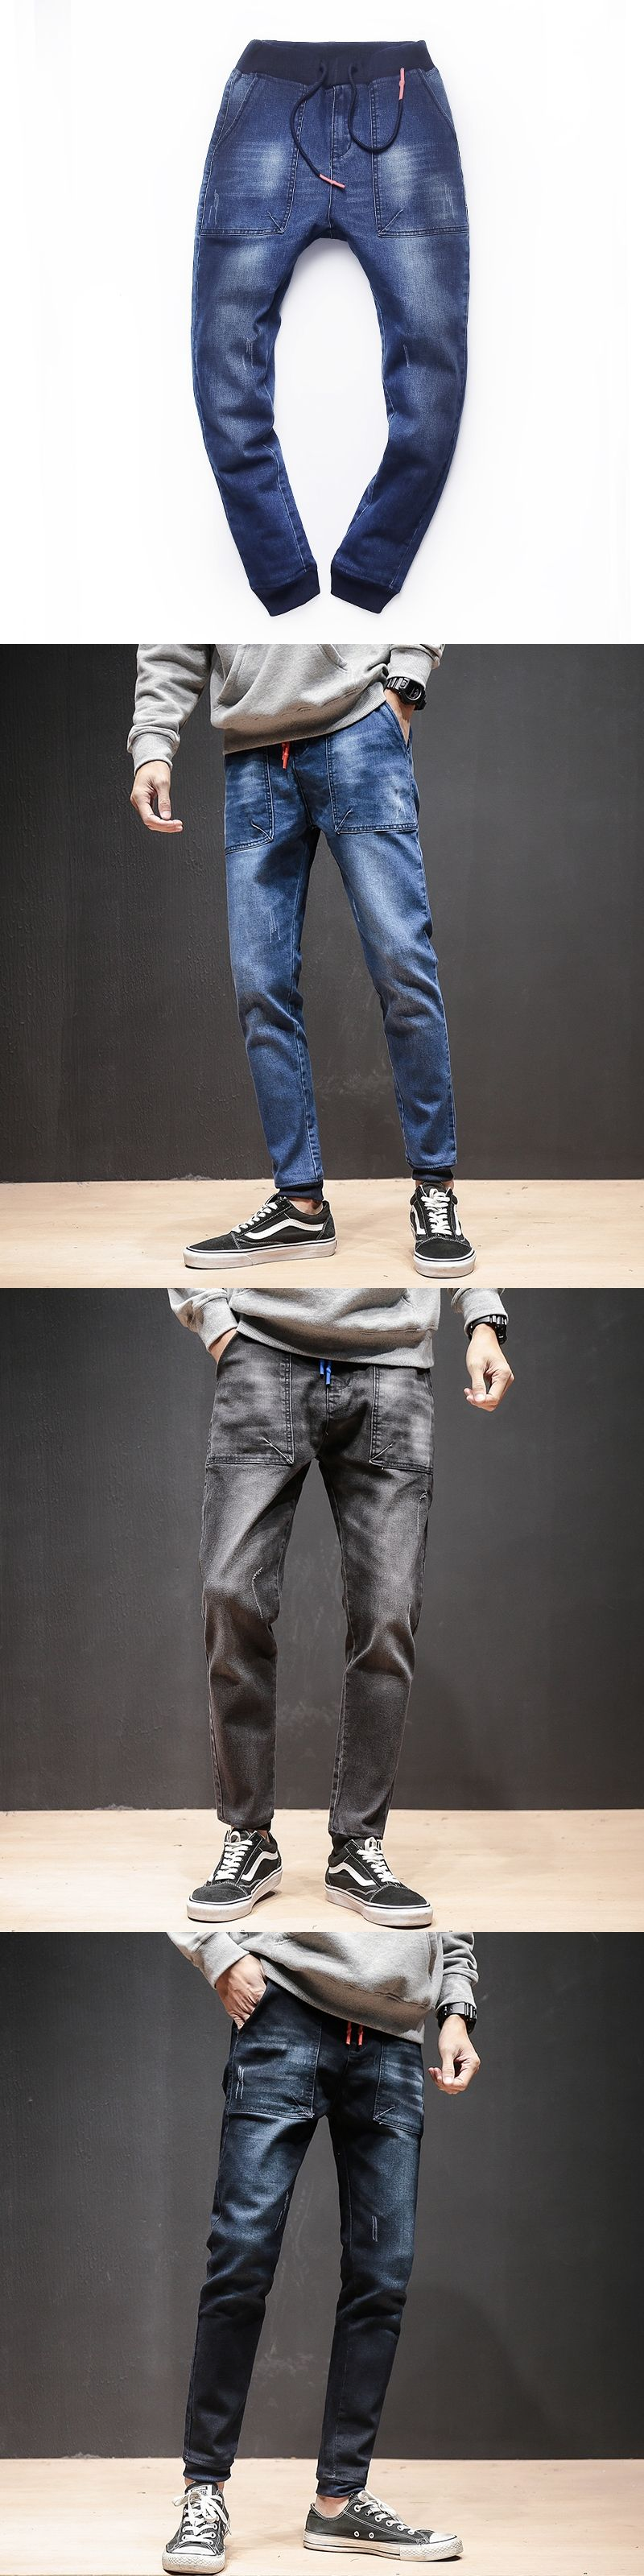 2017 Fashion New Brand Mens Harem Jeans Legging Denim Pants Elastic Feet Pants Men Hip Hop Rap Blue Jeans Skinny Jumpsuit Skinny Pants